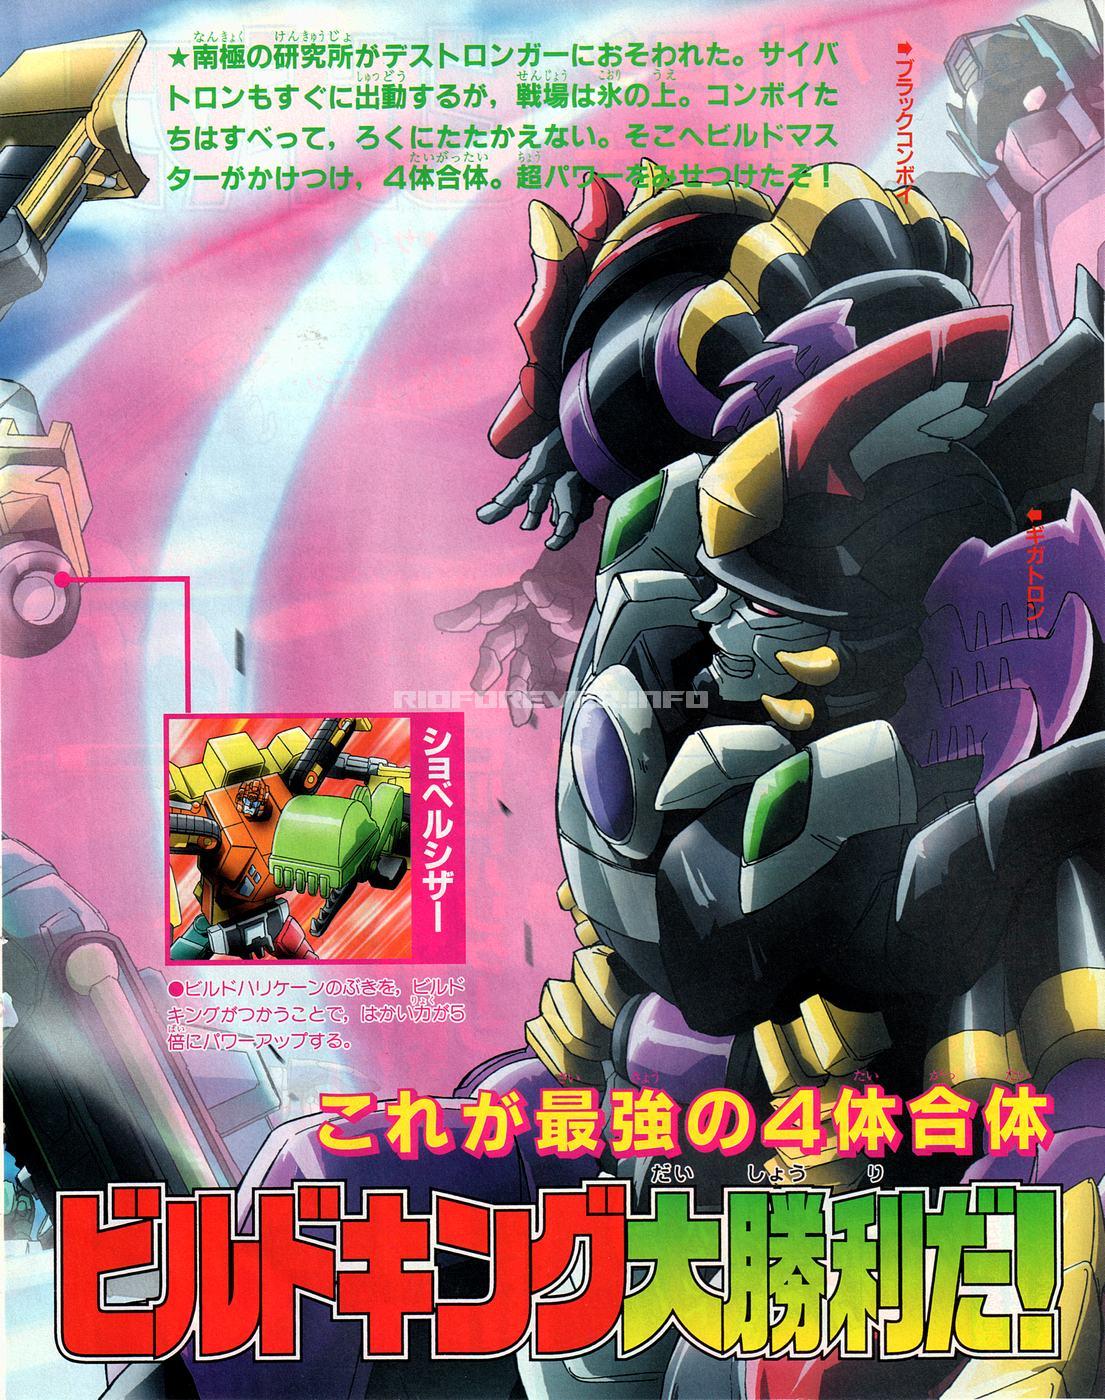 TV Magazine 2000-09-6-1